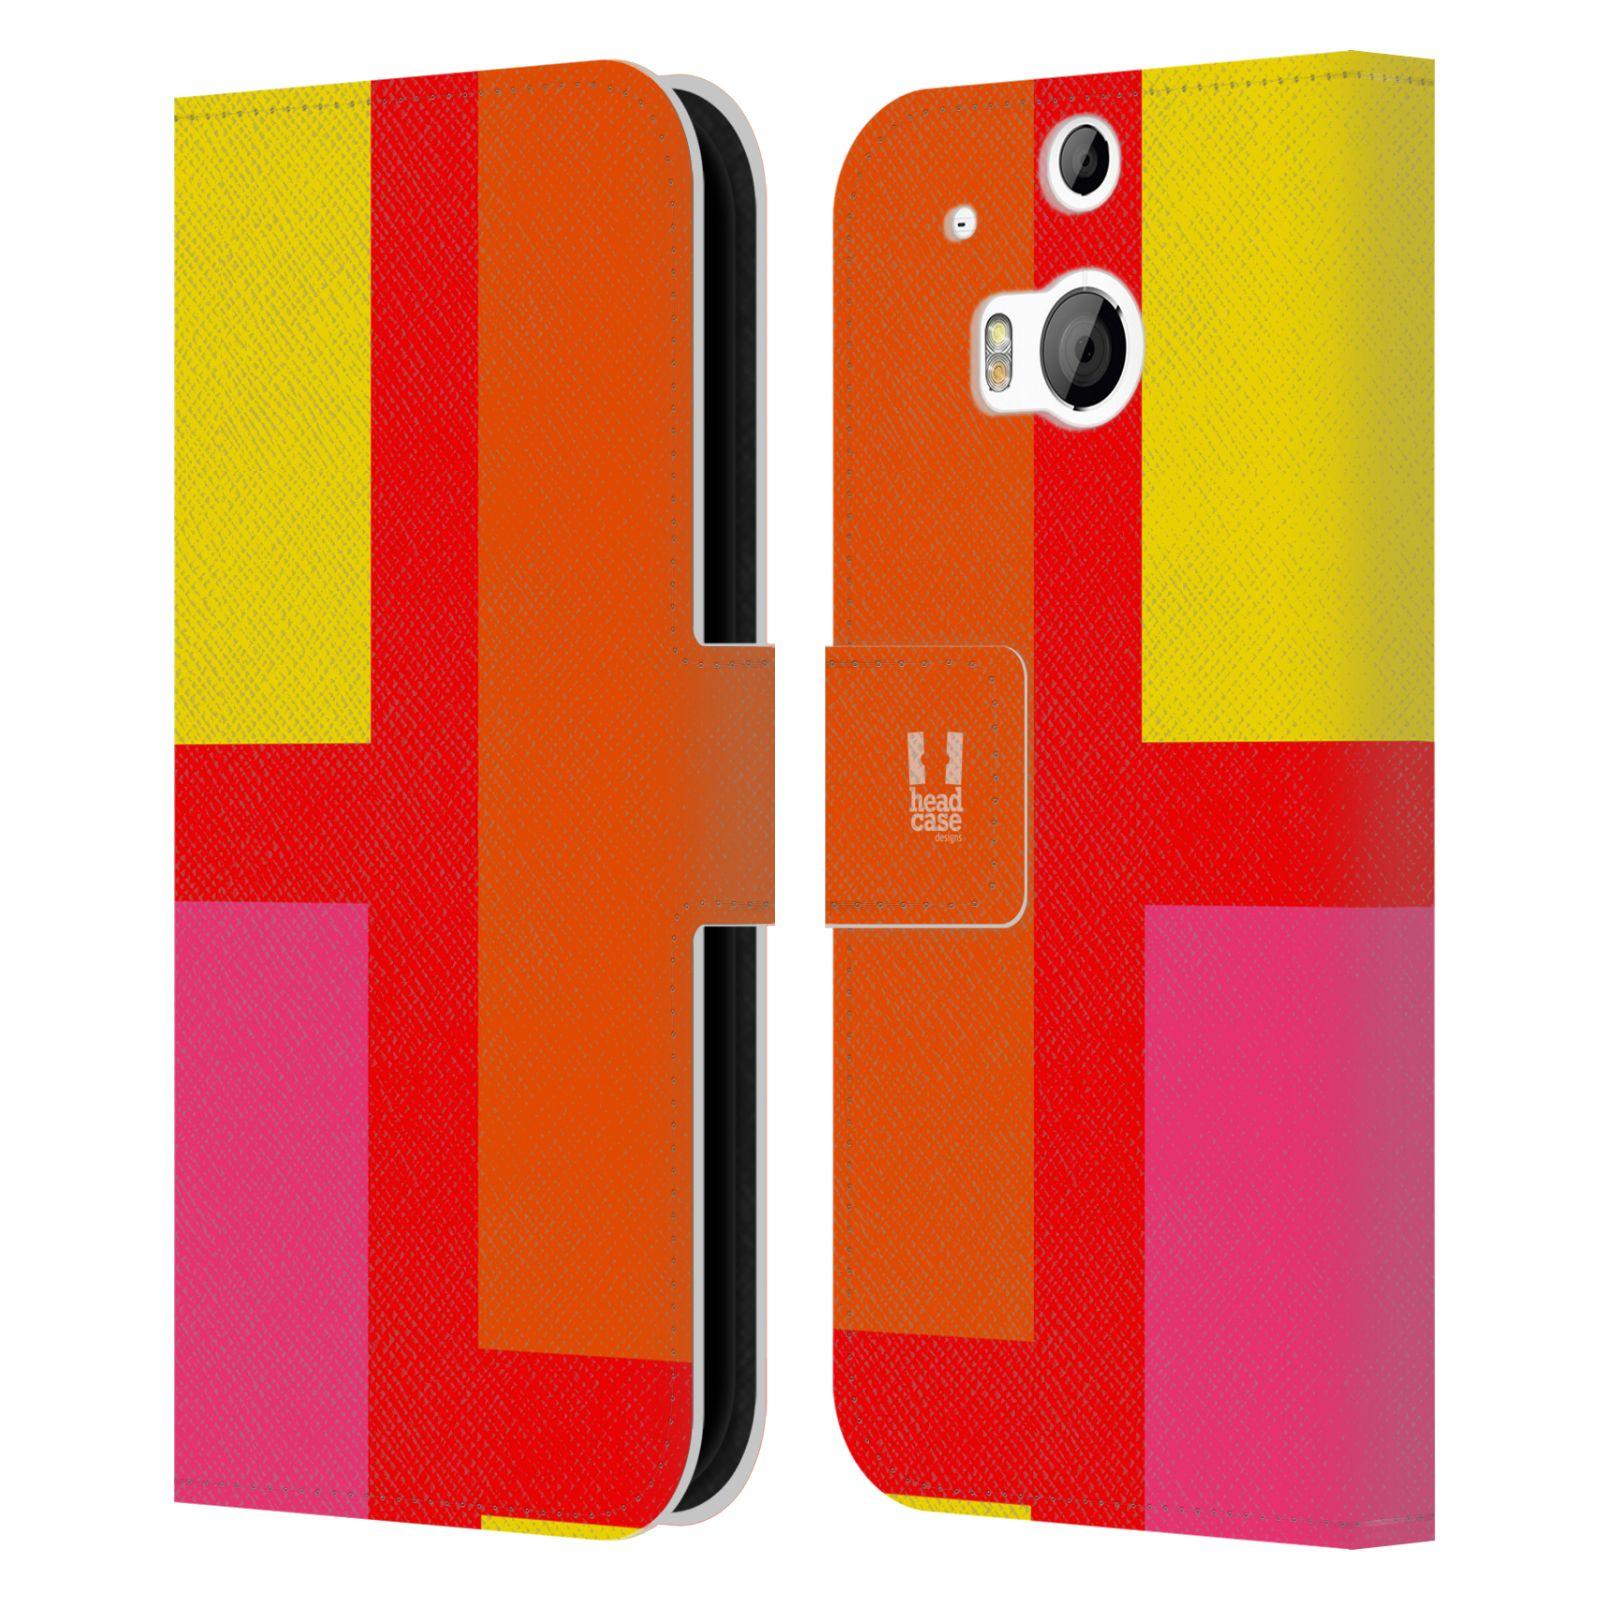 HEAD CASE Flipové pouzdro pro mobil HTC ONE M8/M8s barevné tvary oranžová ulice